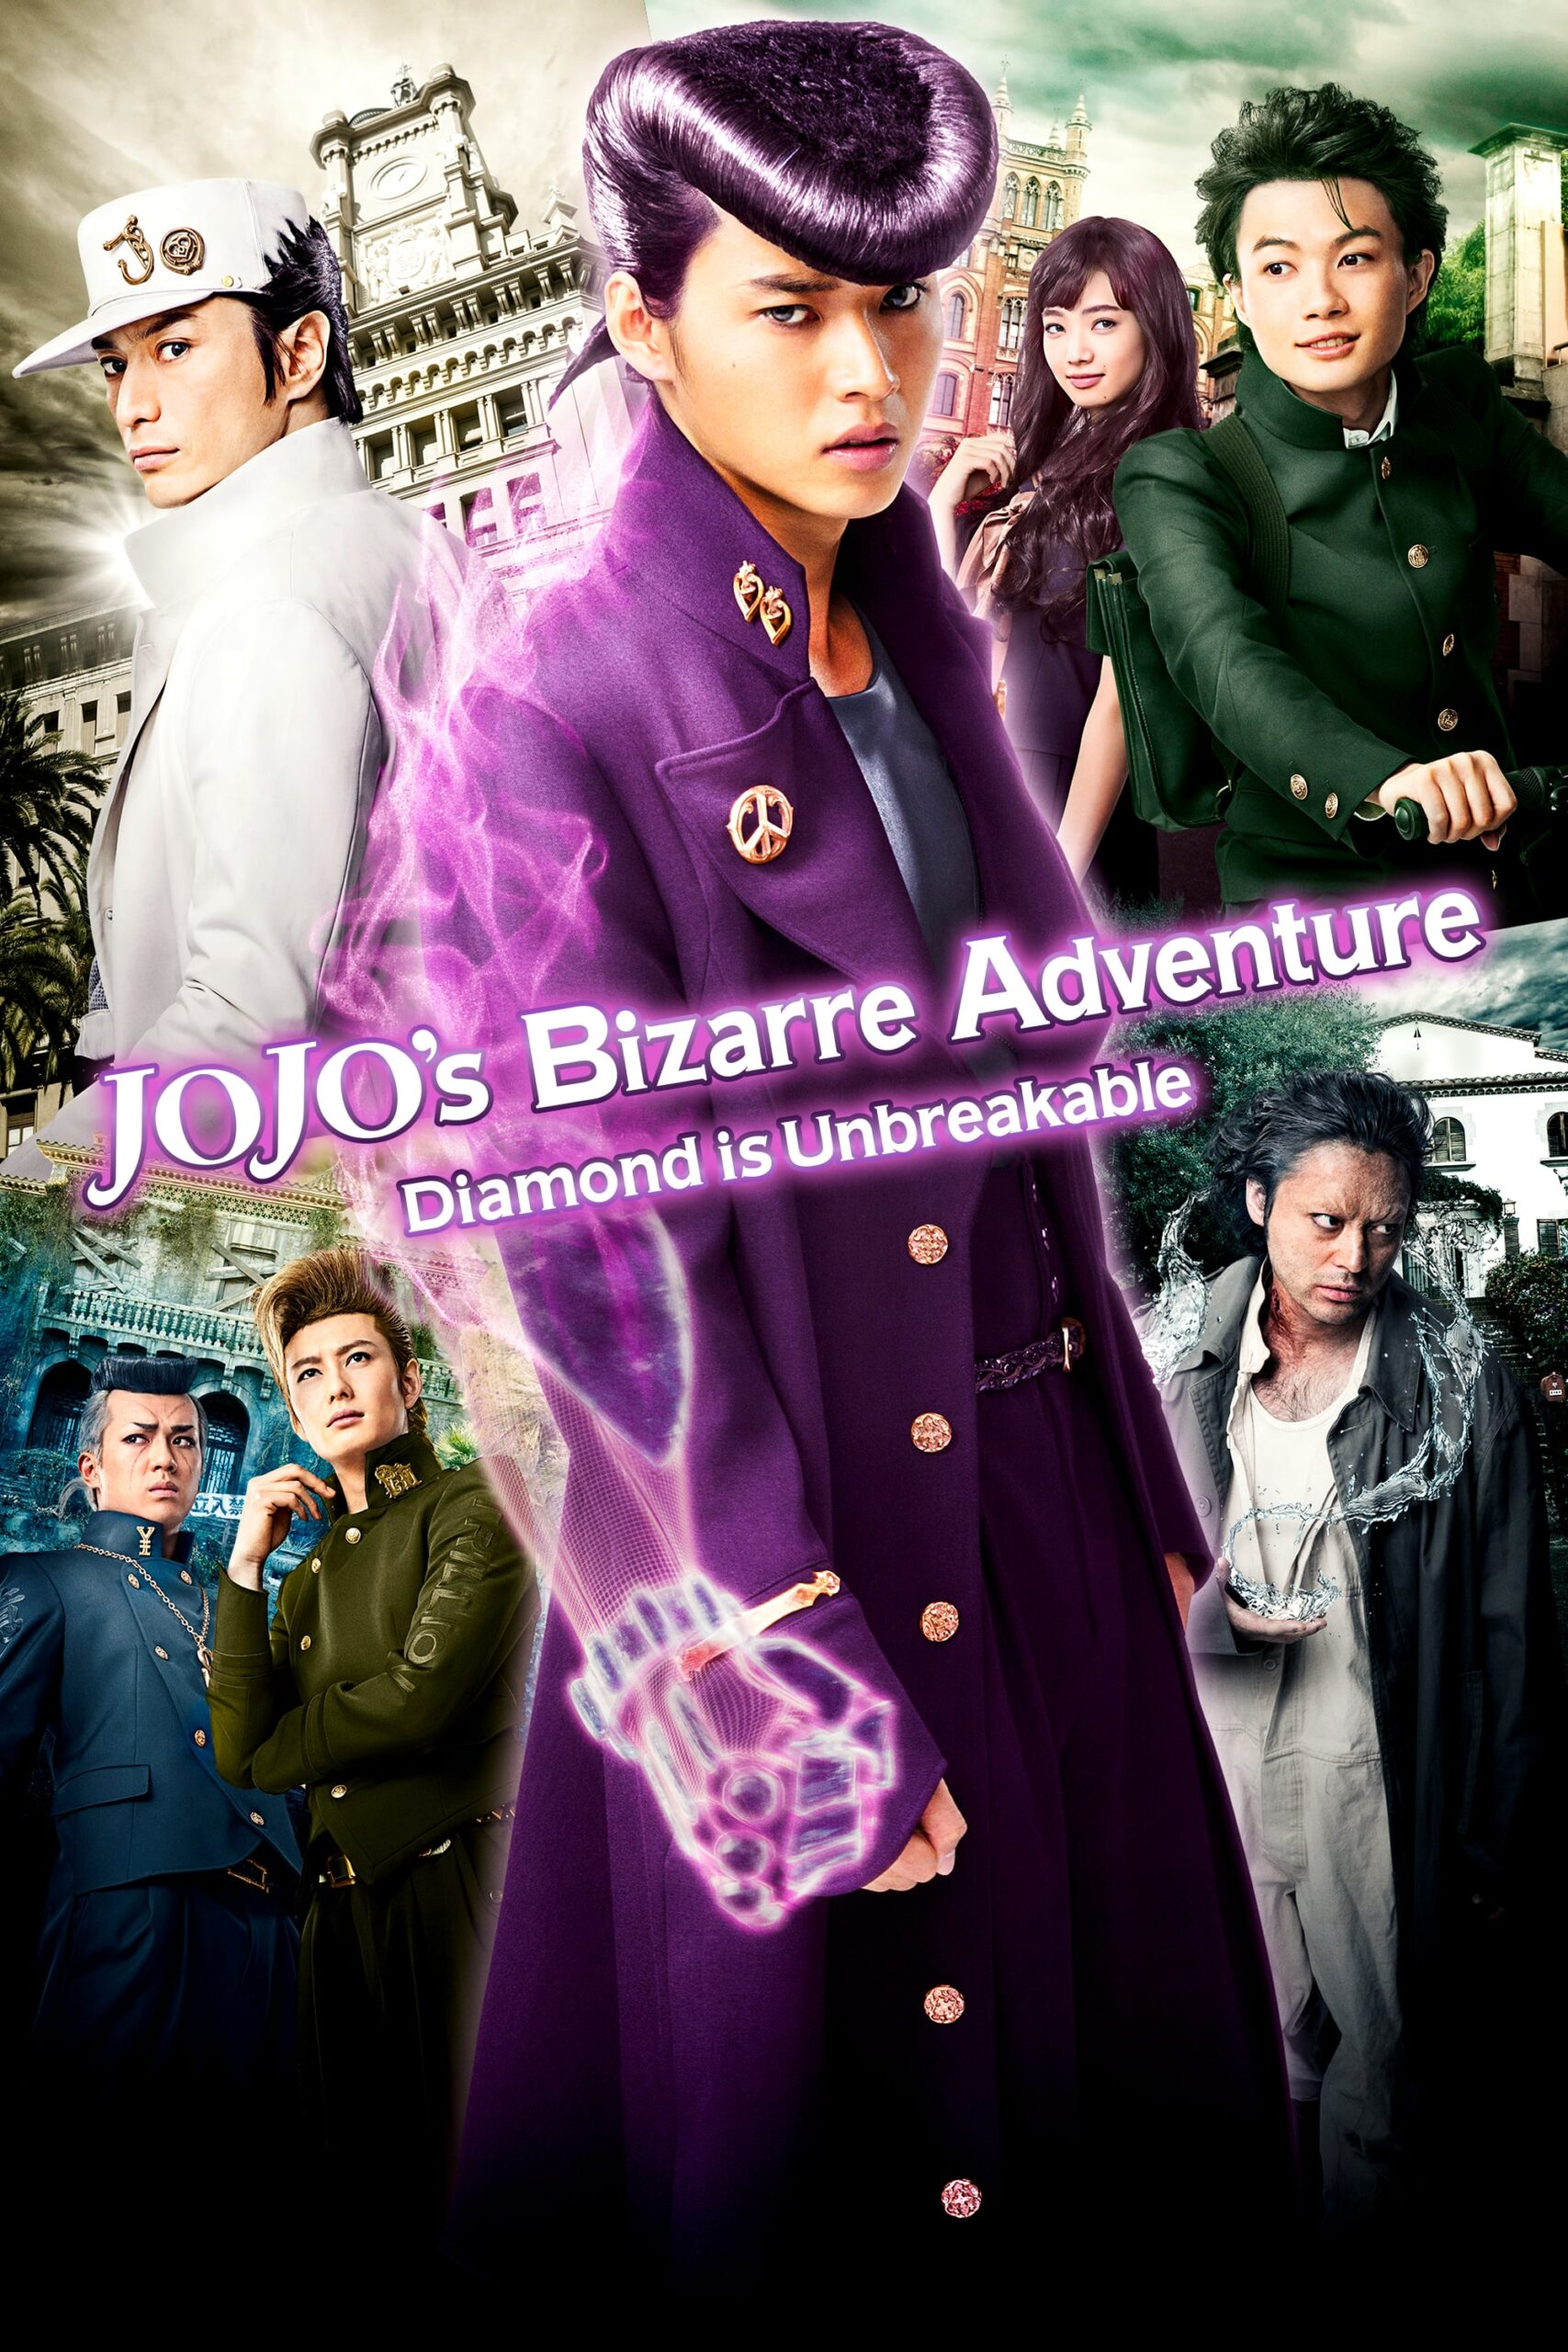 After Chapter 1 Streaming : after, chapter, streaming, JoJo's, Bizarre, Adventure:, Diamond, Unbreakable, Chapter, Japanese, Movie, Streaming, Online, Watch